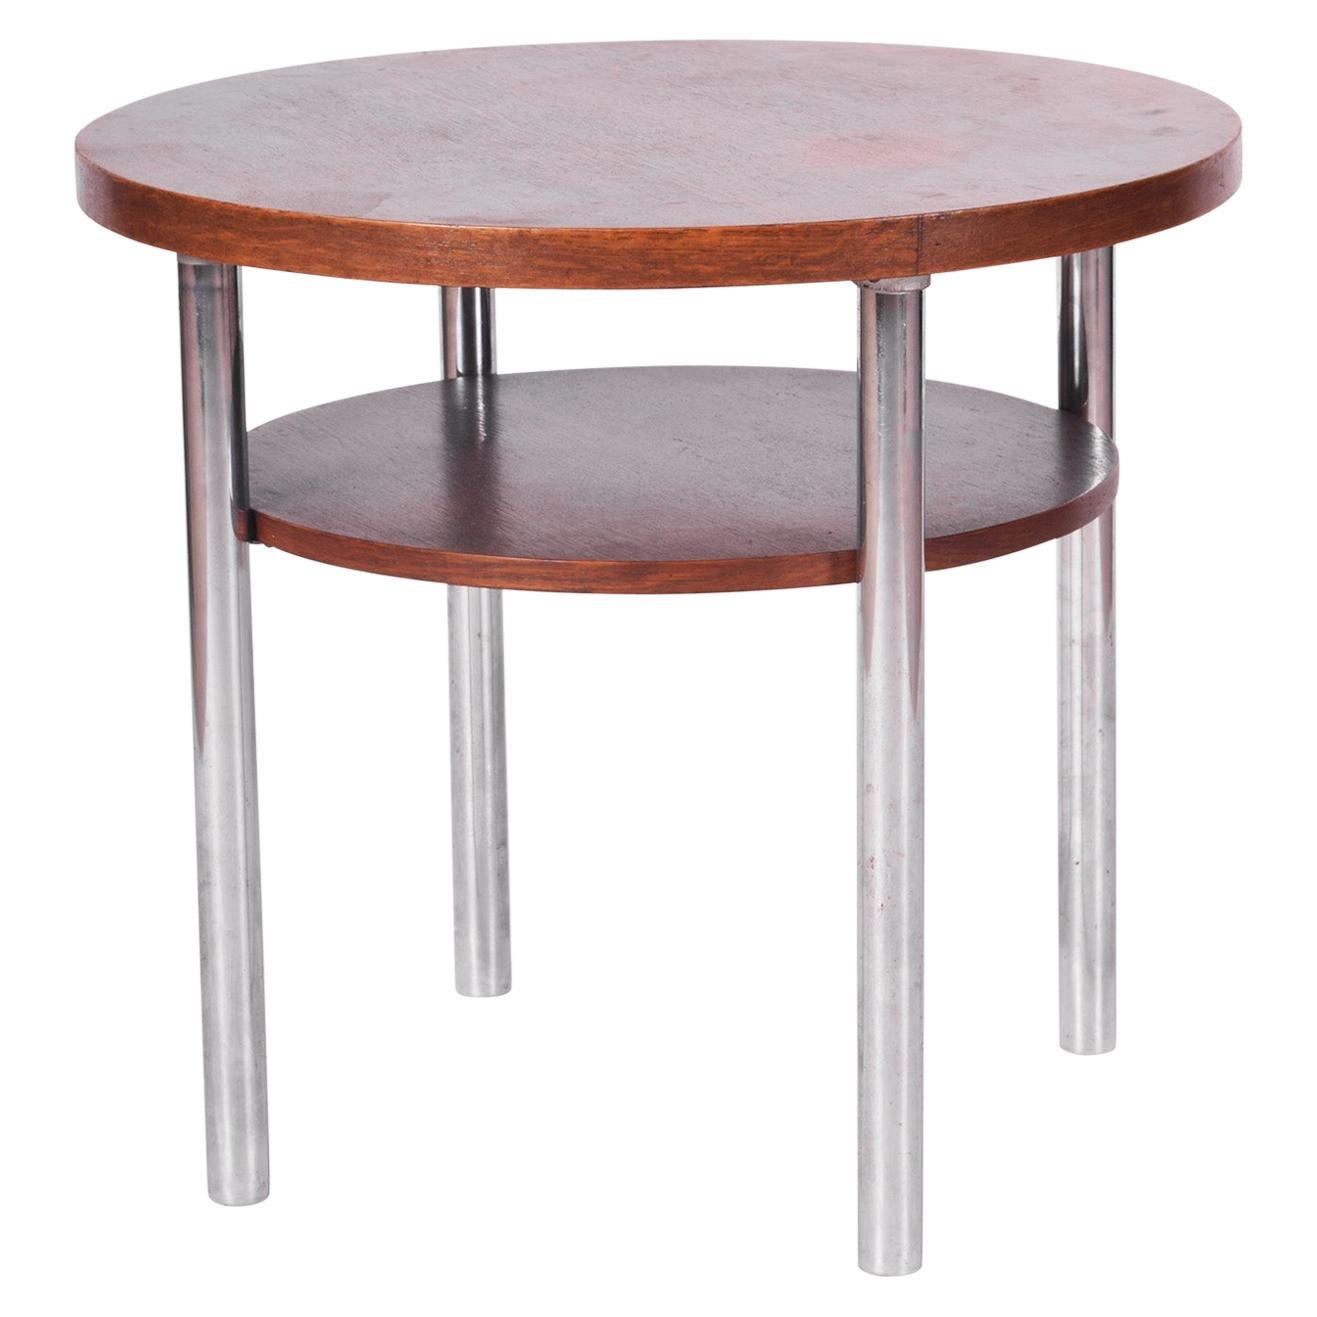 Restored Czech Round Oak Bauhaus Table by Mücke & Melder, Chrome, 1930s